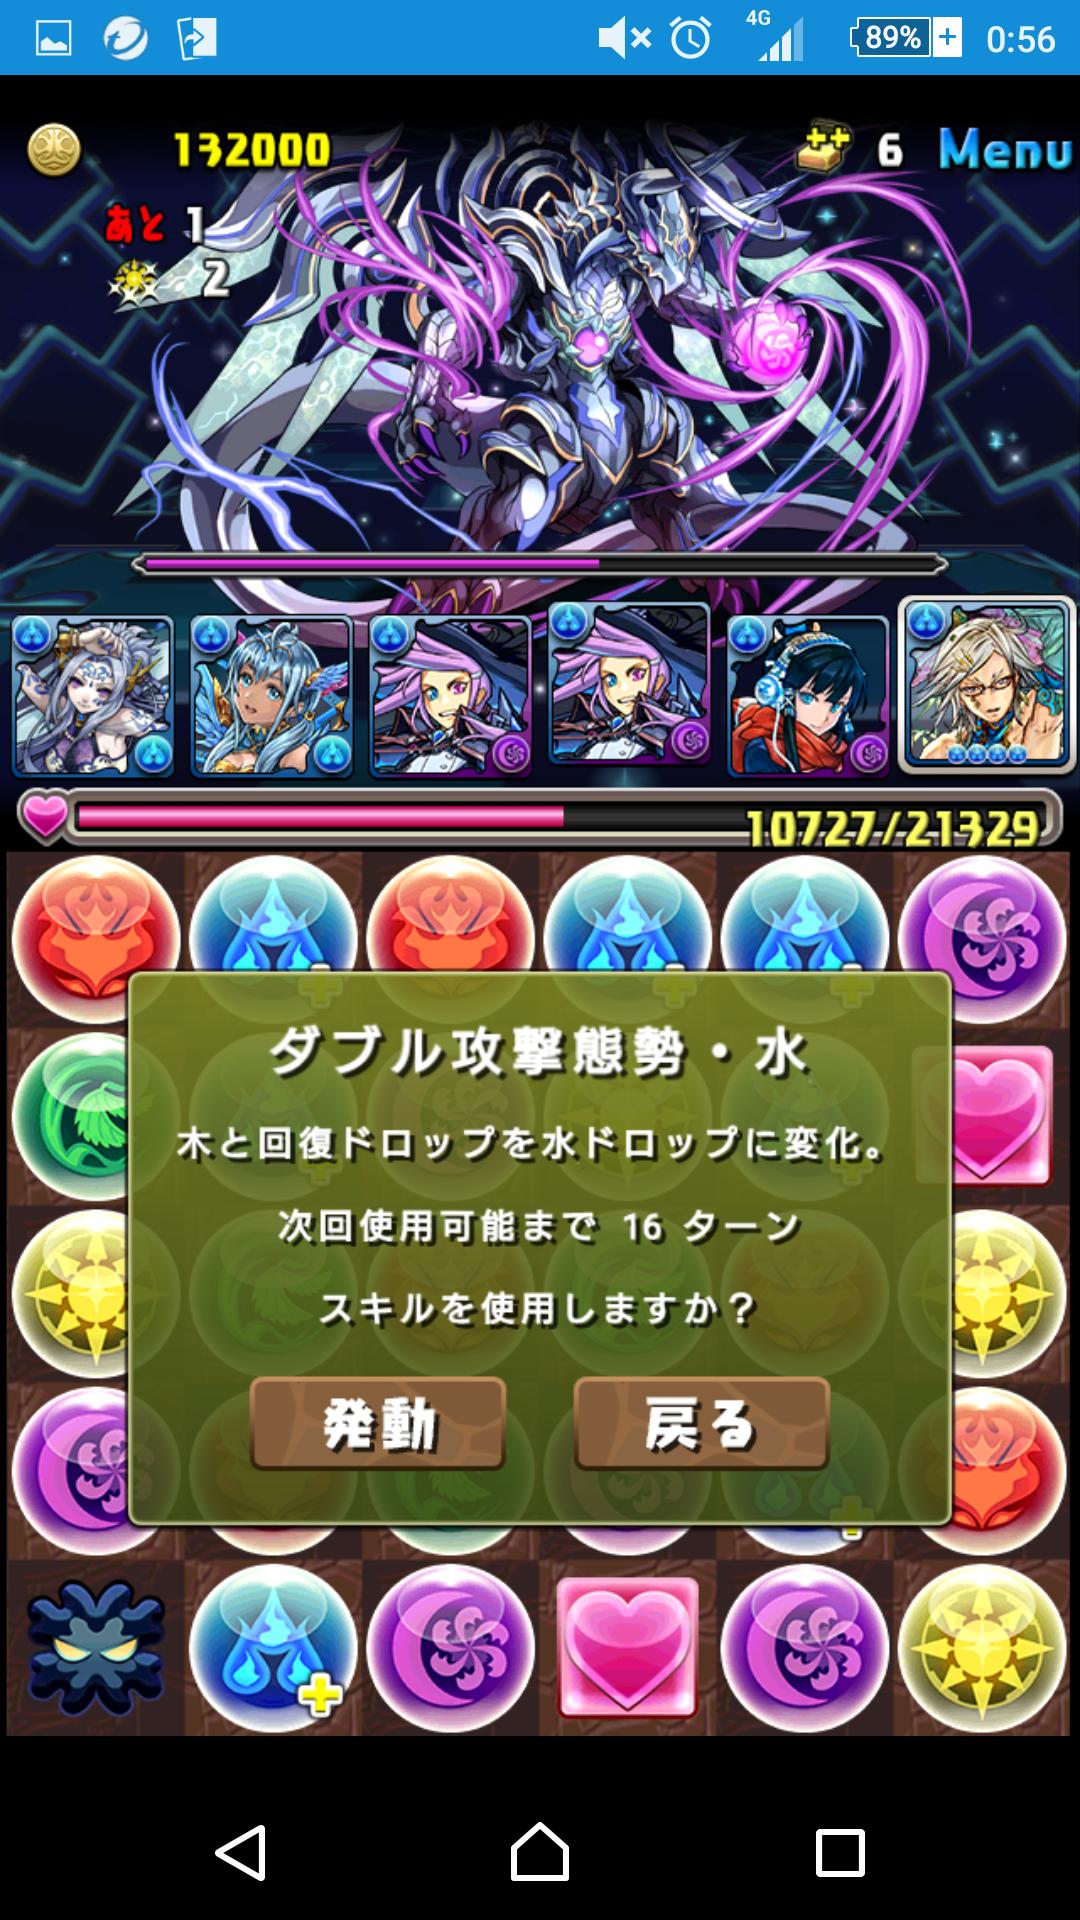 Screenshot_2016-05-16-00-56-46.png